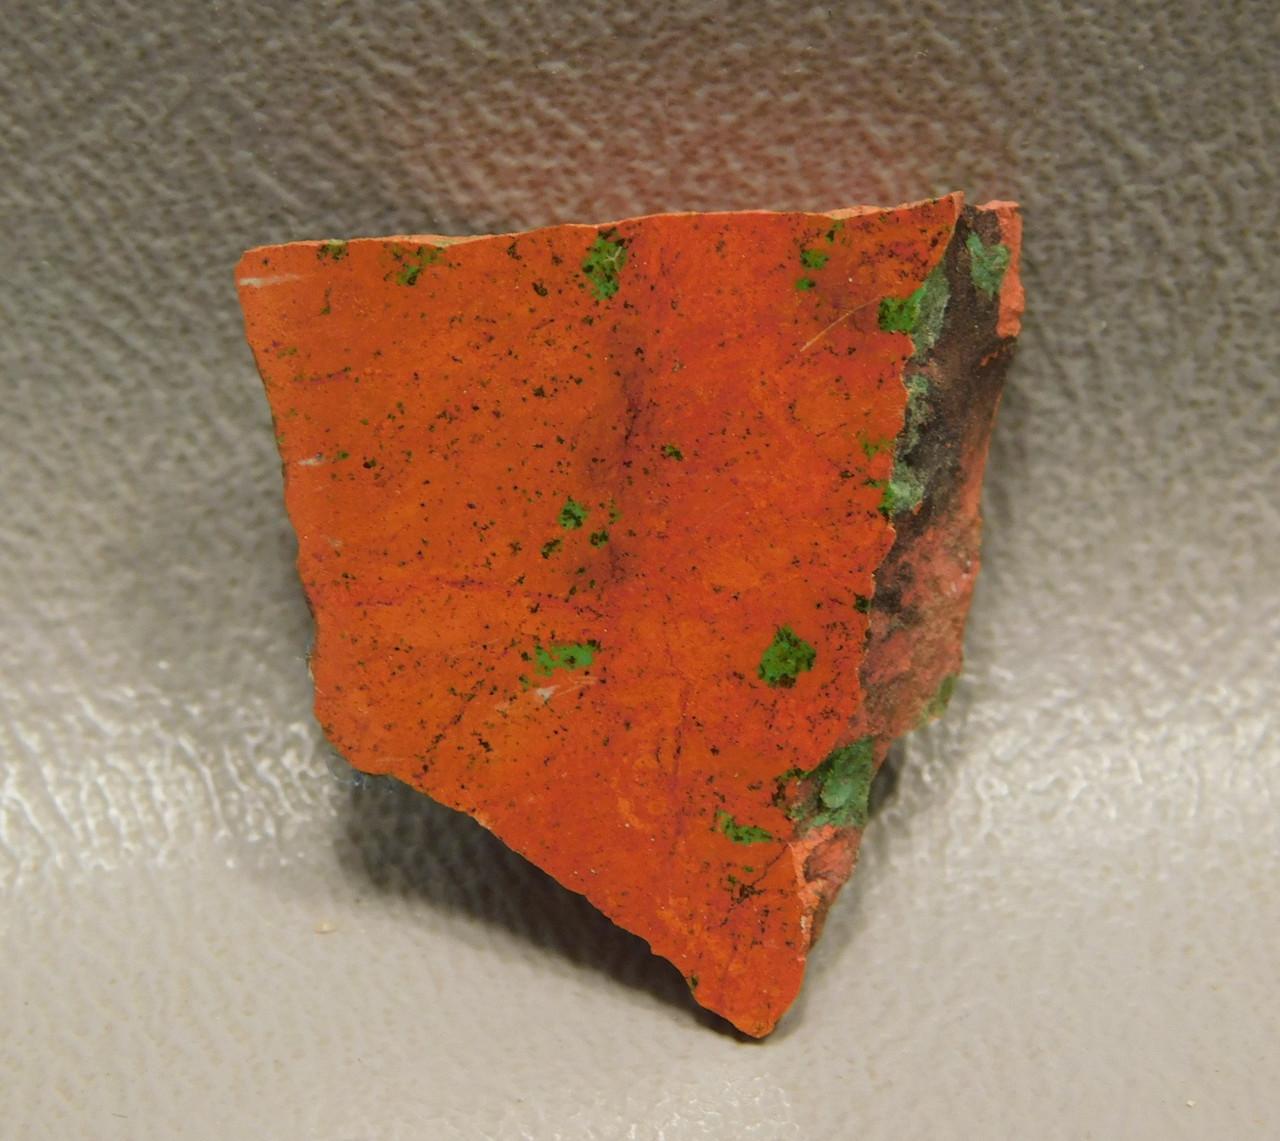 Sonora Sunrise Polished Slab Natural Stone Chrysocolla Cuprite #S2